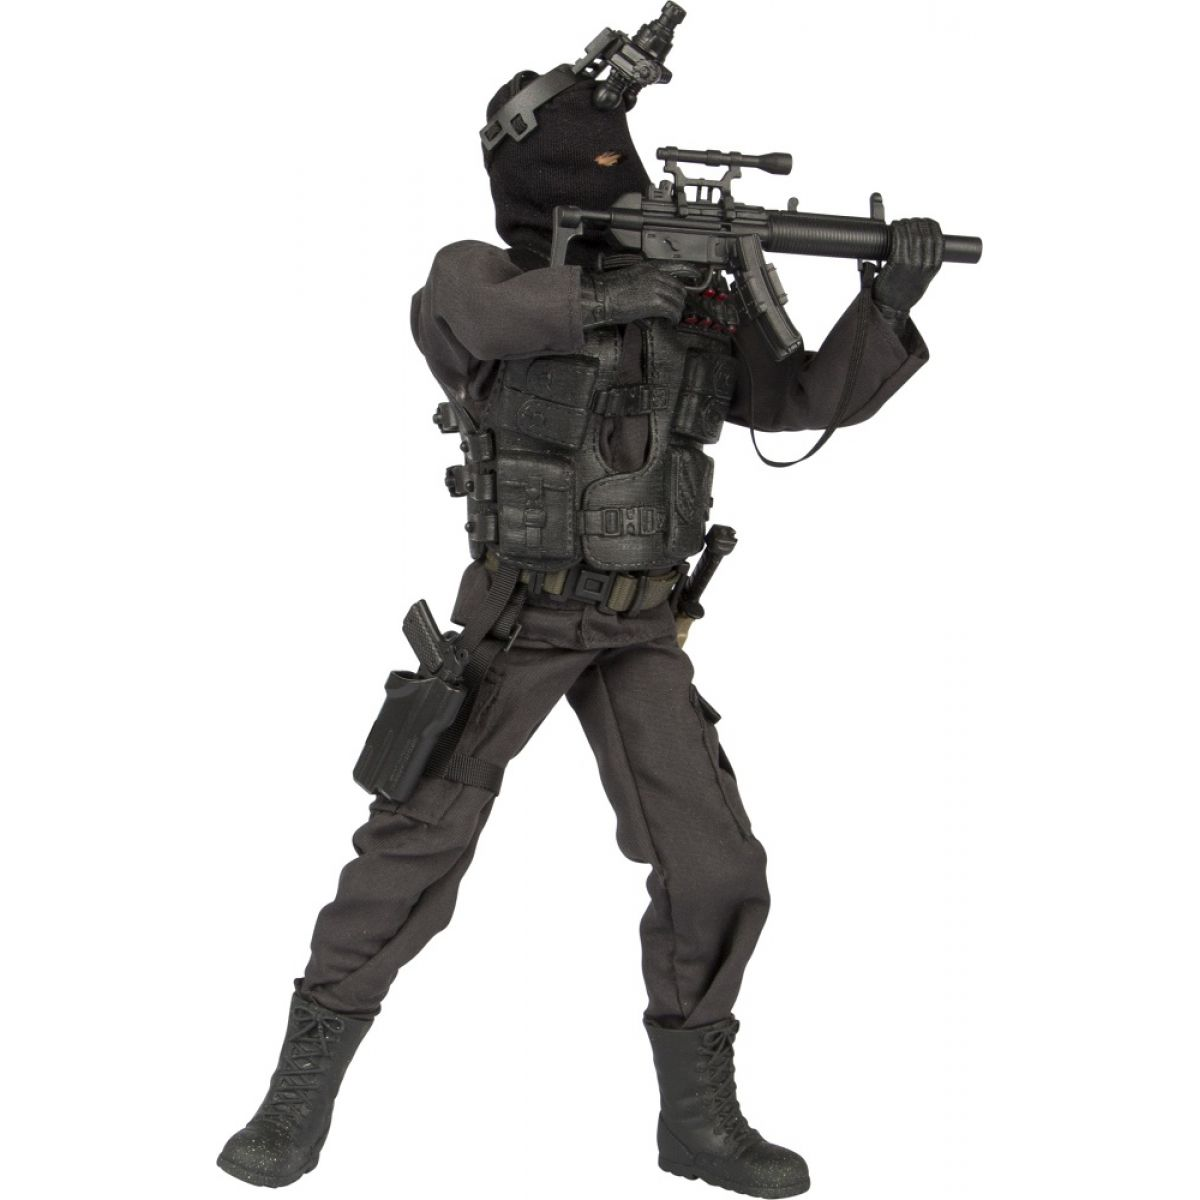 World Peacekeepers Voják figurka 30,5cm - Navy Seal Night Operation